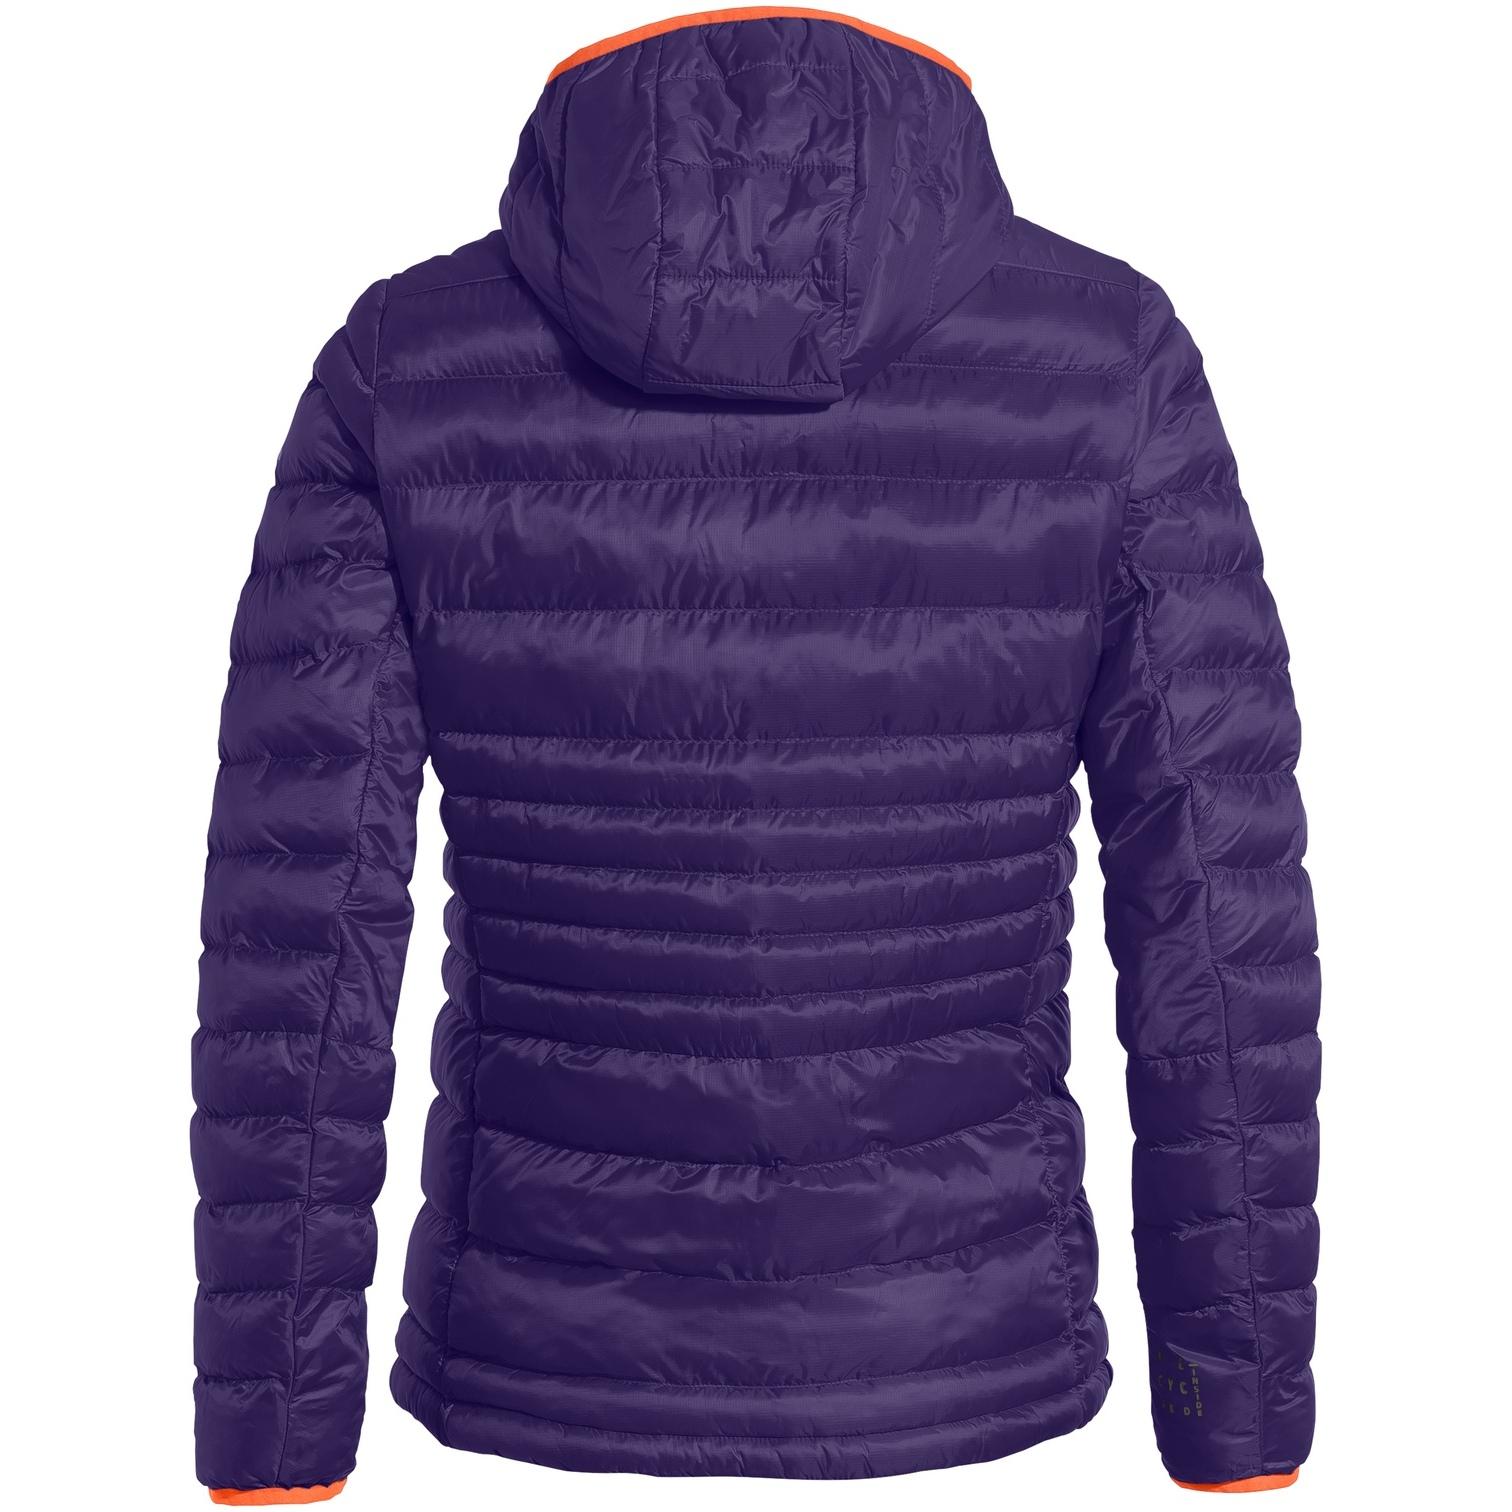 Image of Vaude Women's Batura Hooded Insulation Jacket - dark purple